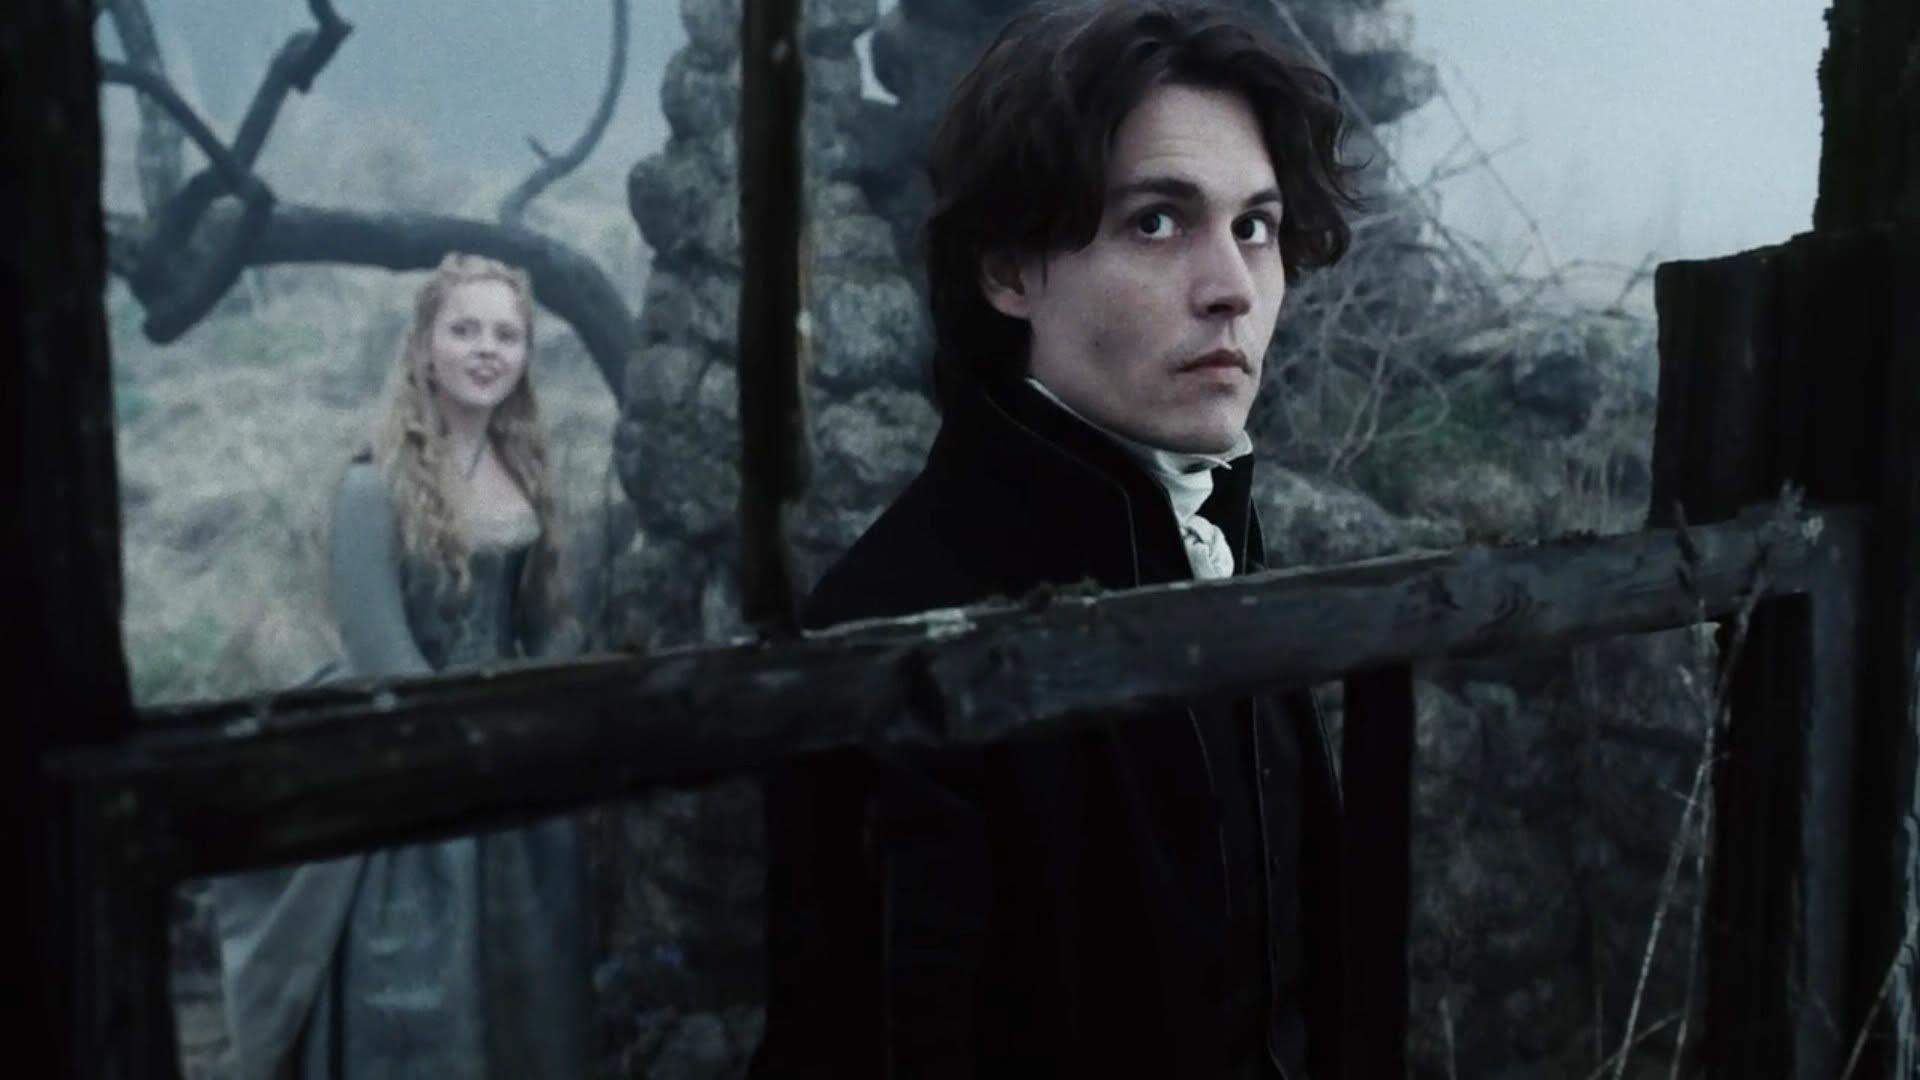 Tim Burton film: Sleepy Hollow